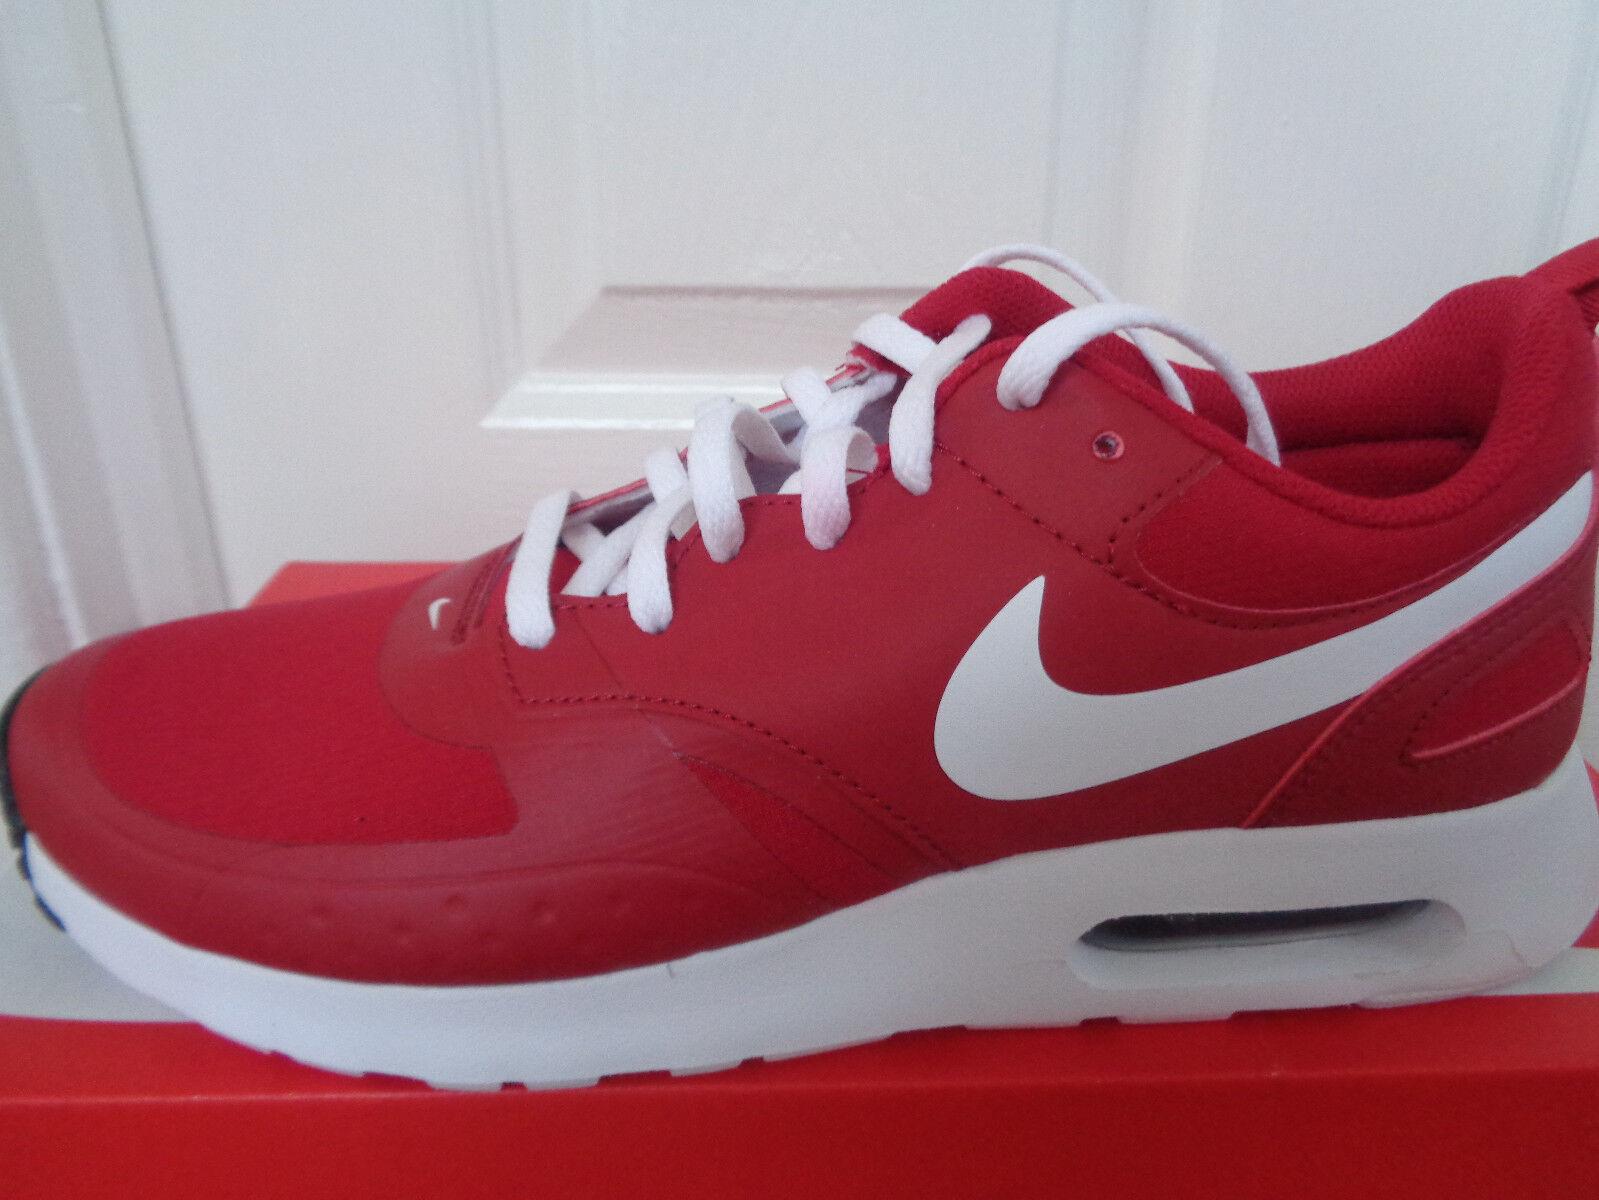 Nike Air Max Vision mens trainers schuhe 918230 600 uk 7.5 eu 42 us 8.5 NEW+BOX